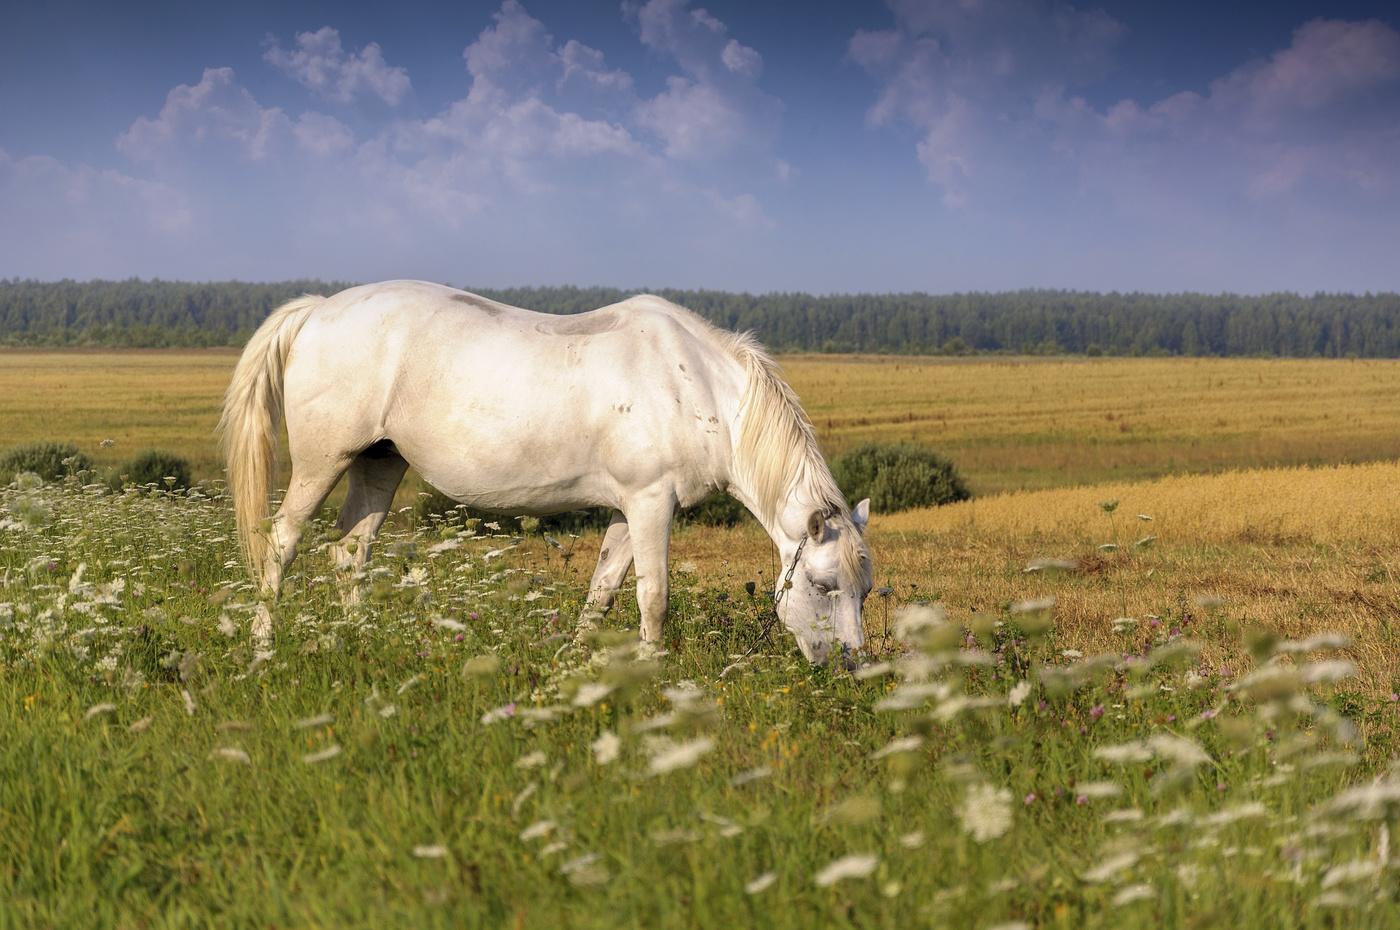 декоре картинка лошади на лугу лучи весеннего солнца